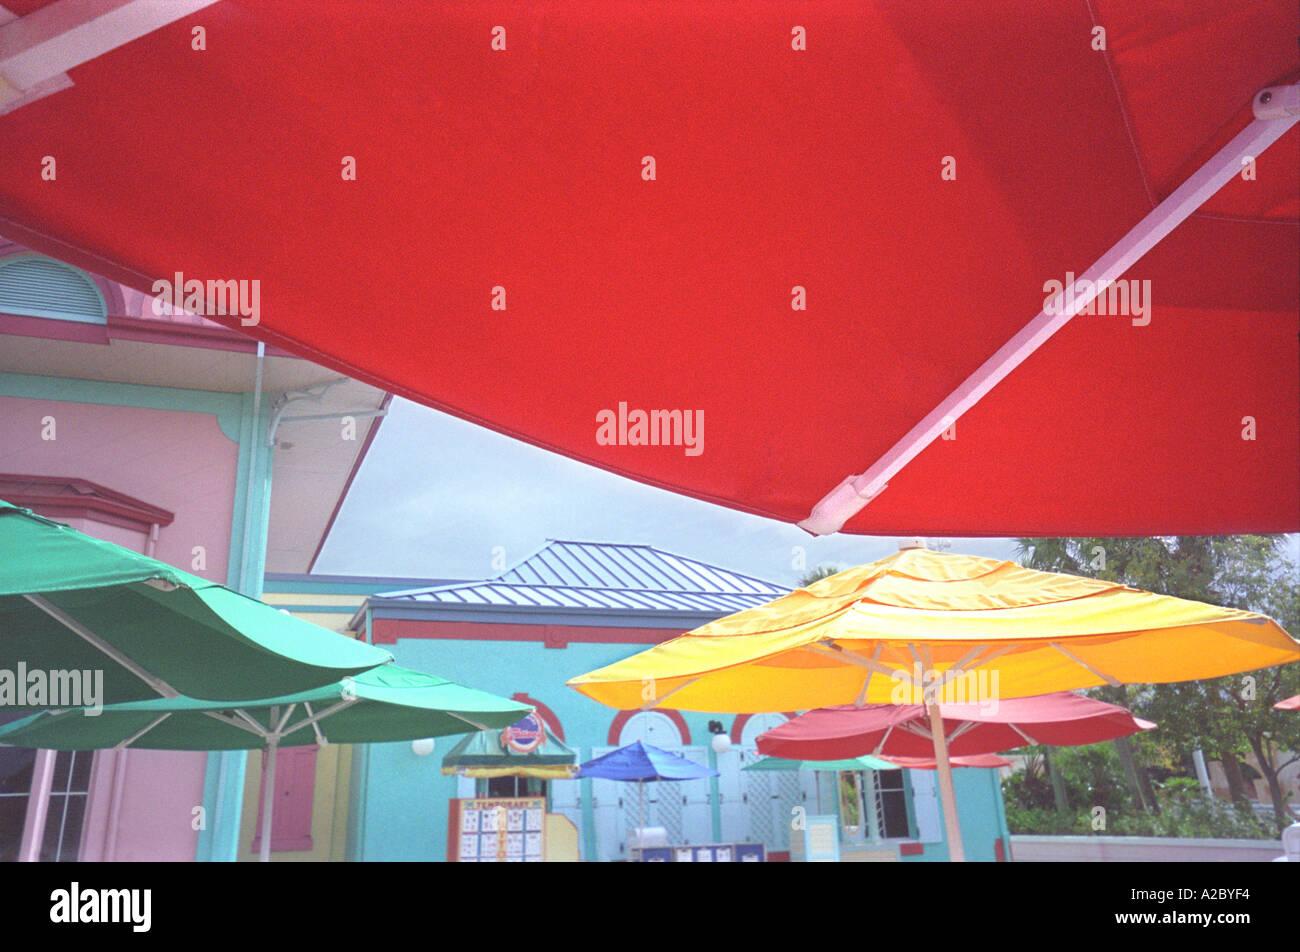 Caribbean Patio With Umbrellas  - Stock Image